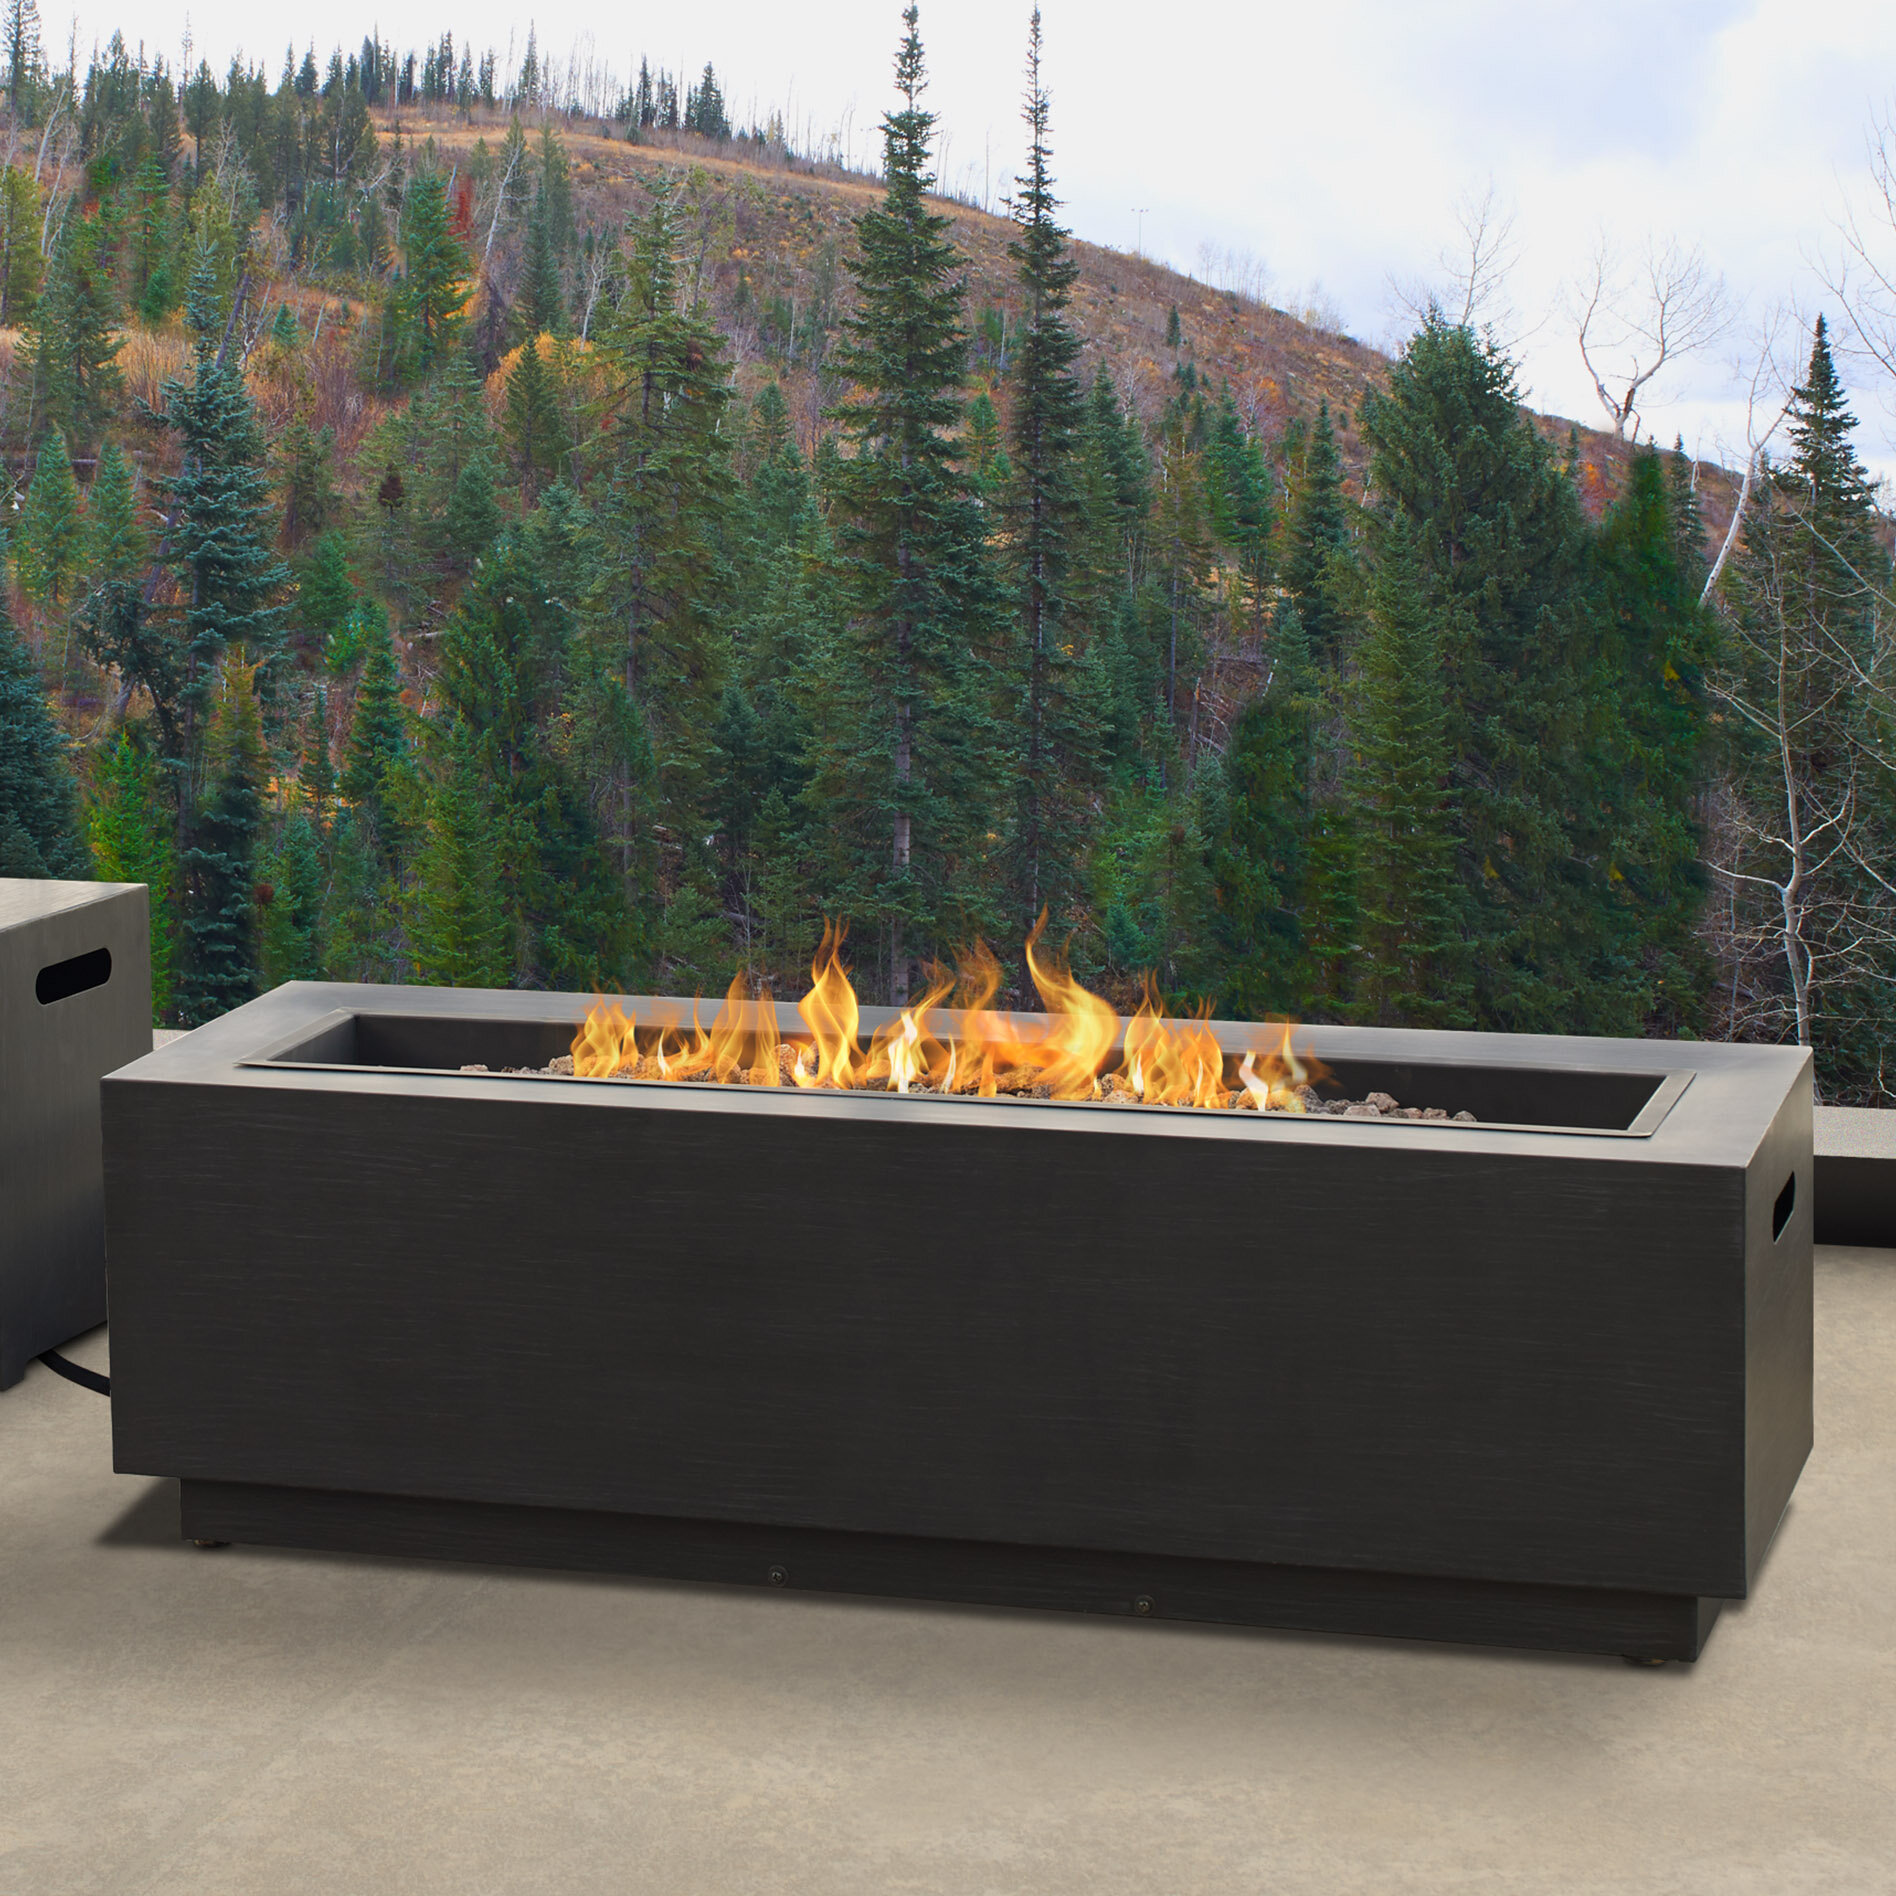 Real Flame Lanesboro Rectangle Steel Propane Natural Gas Fire Pit Reviews Wayfair